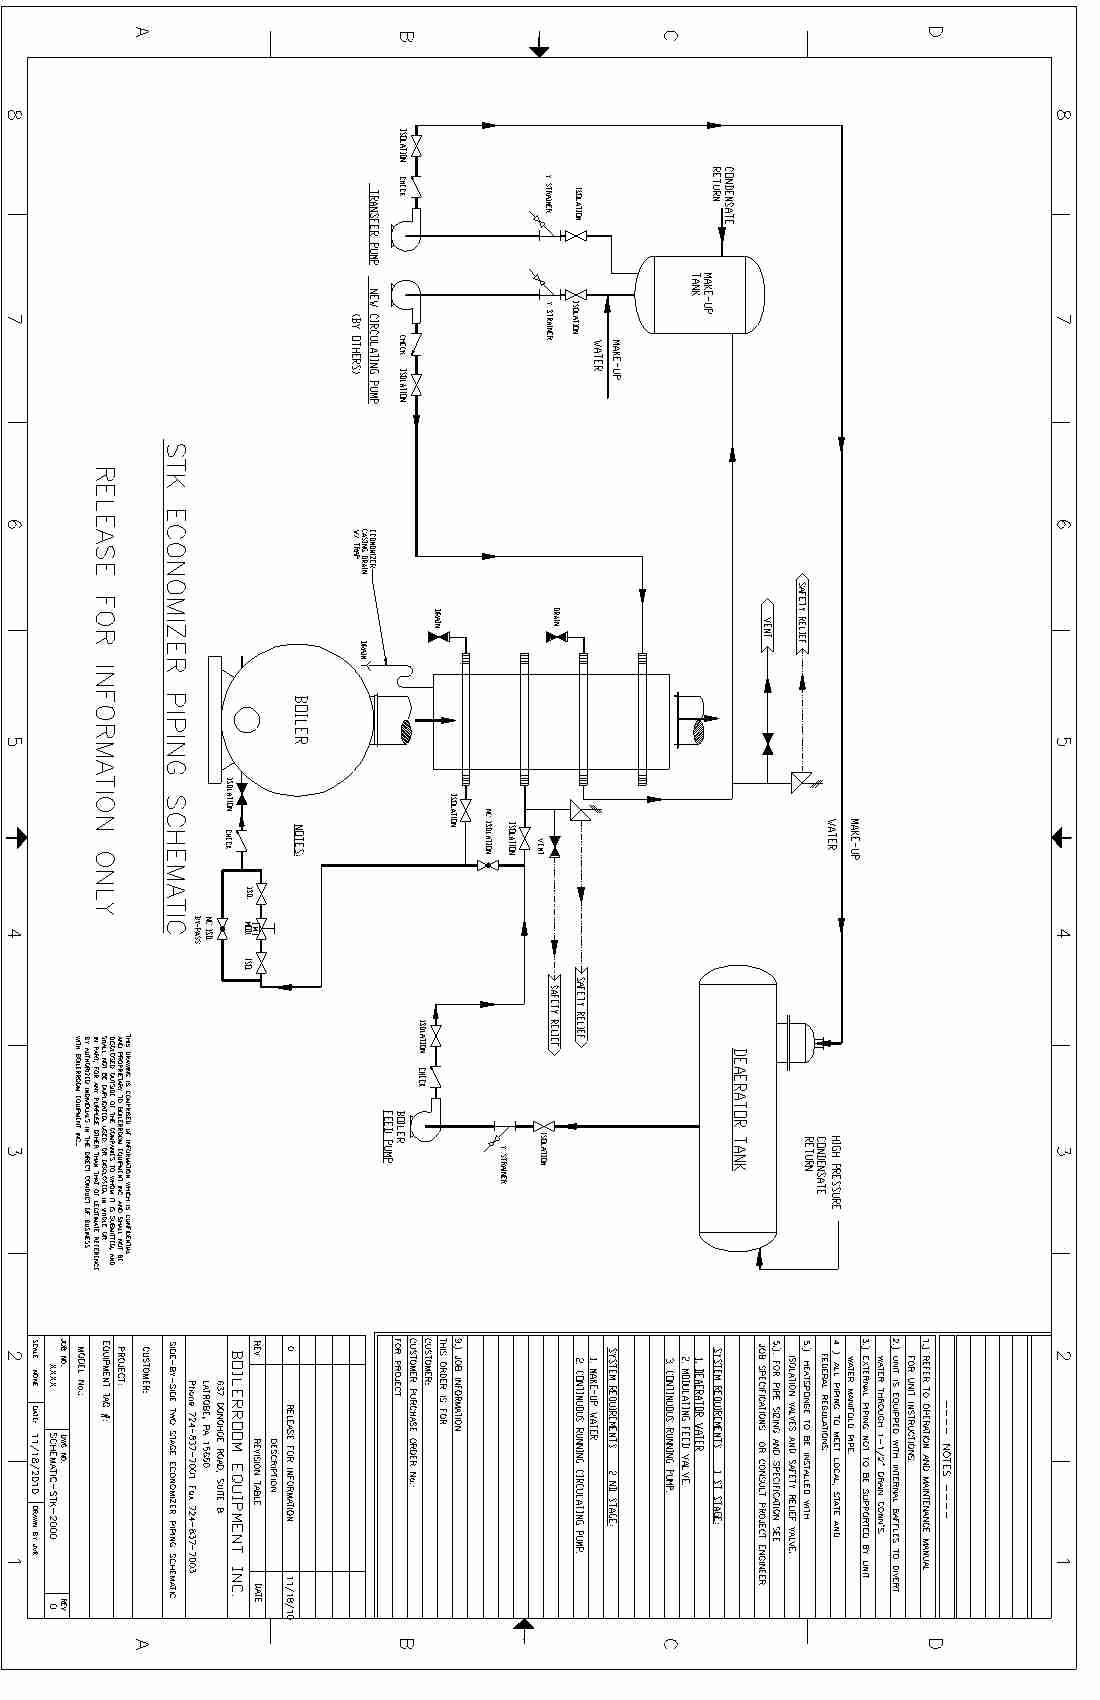 hight resolution of warn xd9000i wiring diagram free download schematic warn warn winch motor wiring diagram warn winch 2500